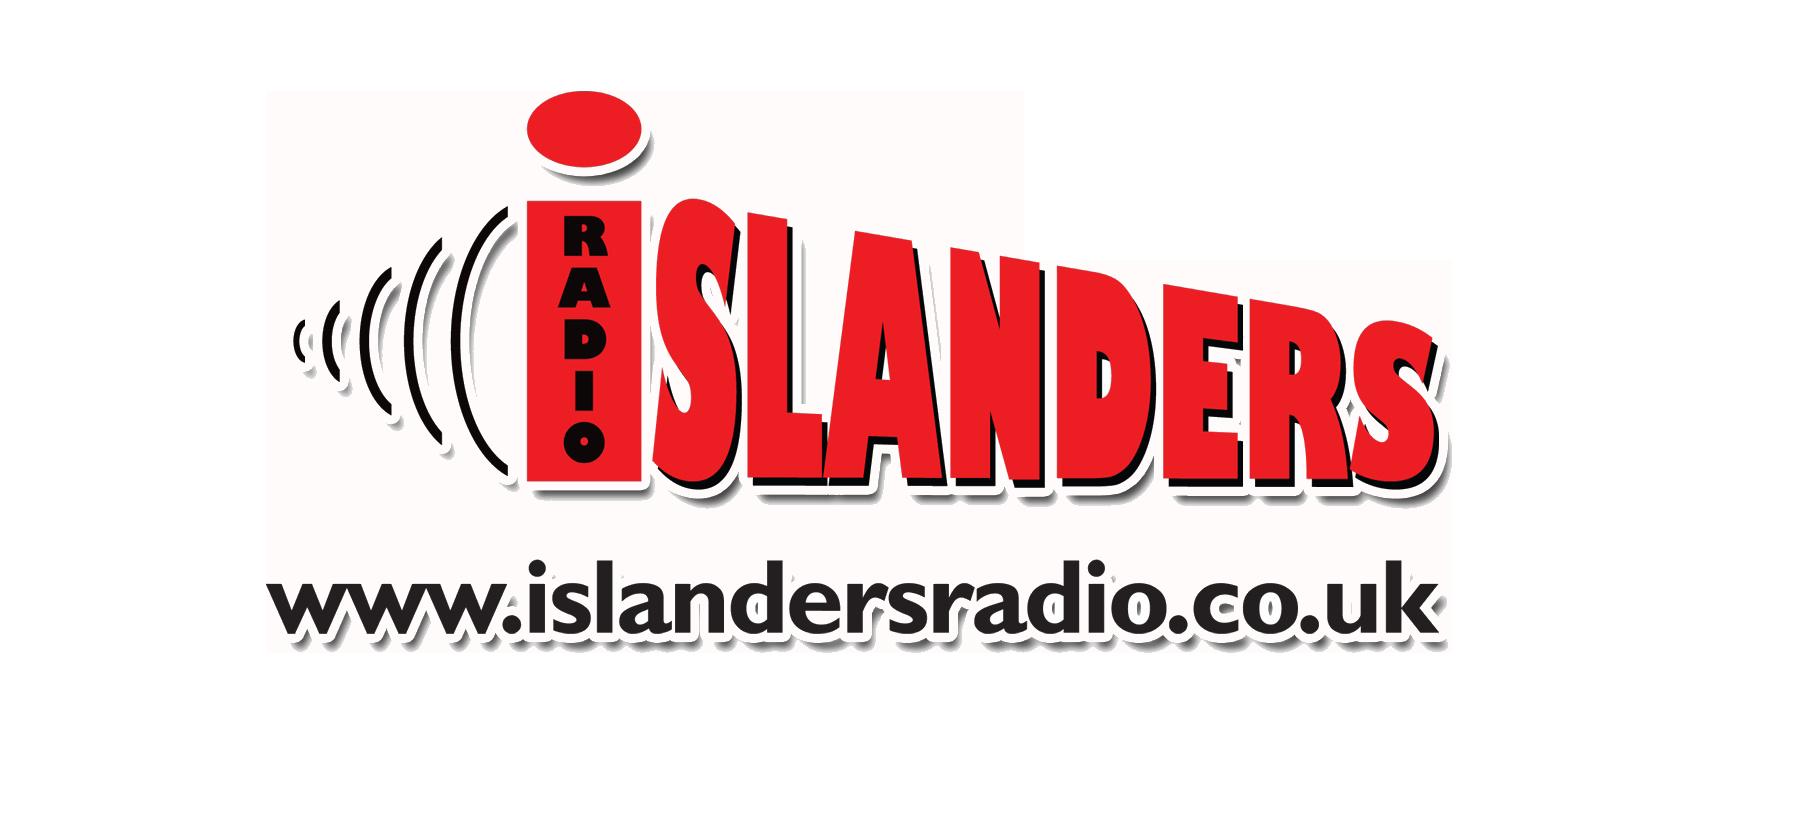 Radio Islanders - logo jpg